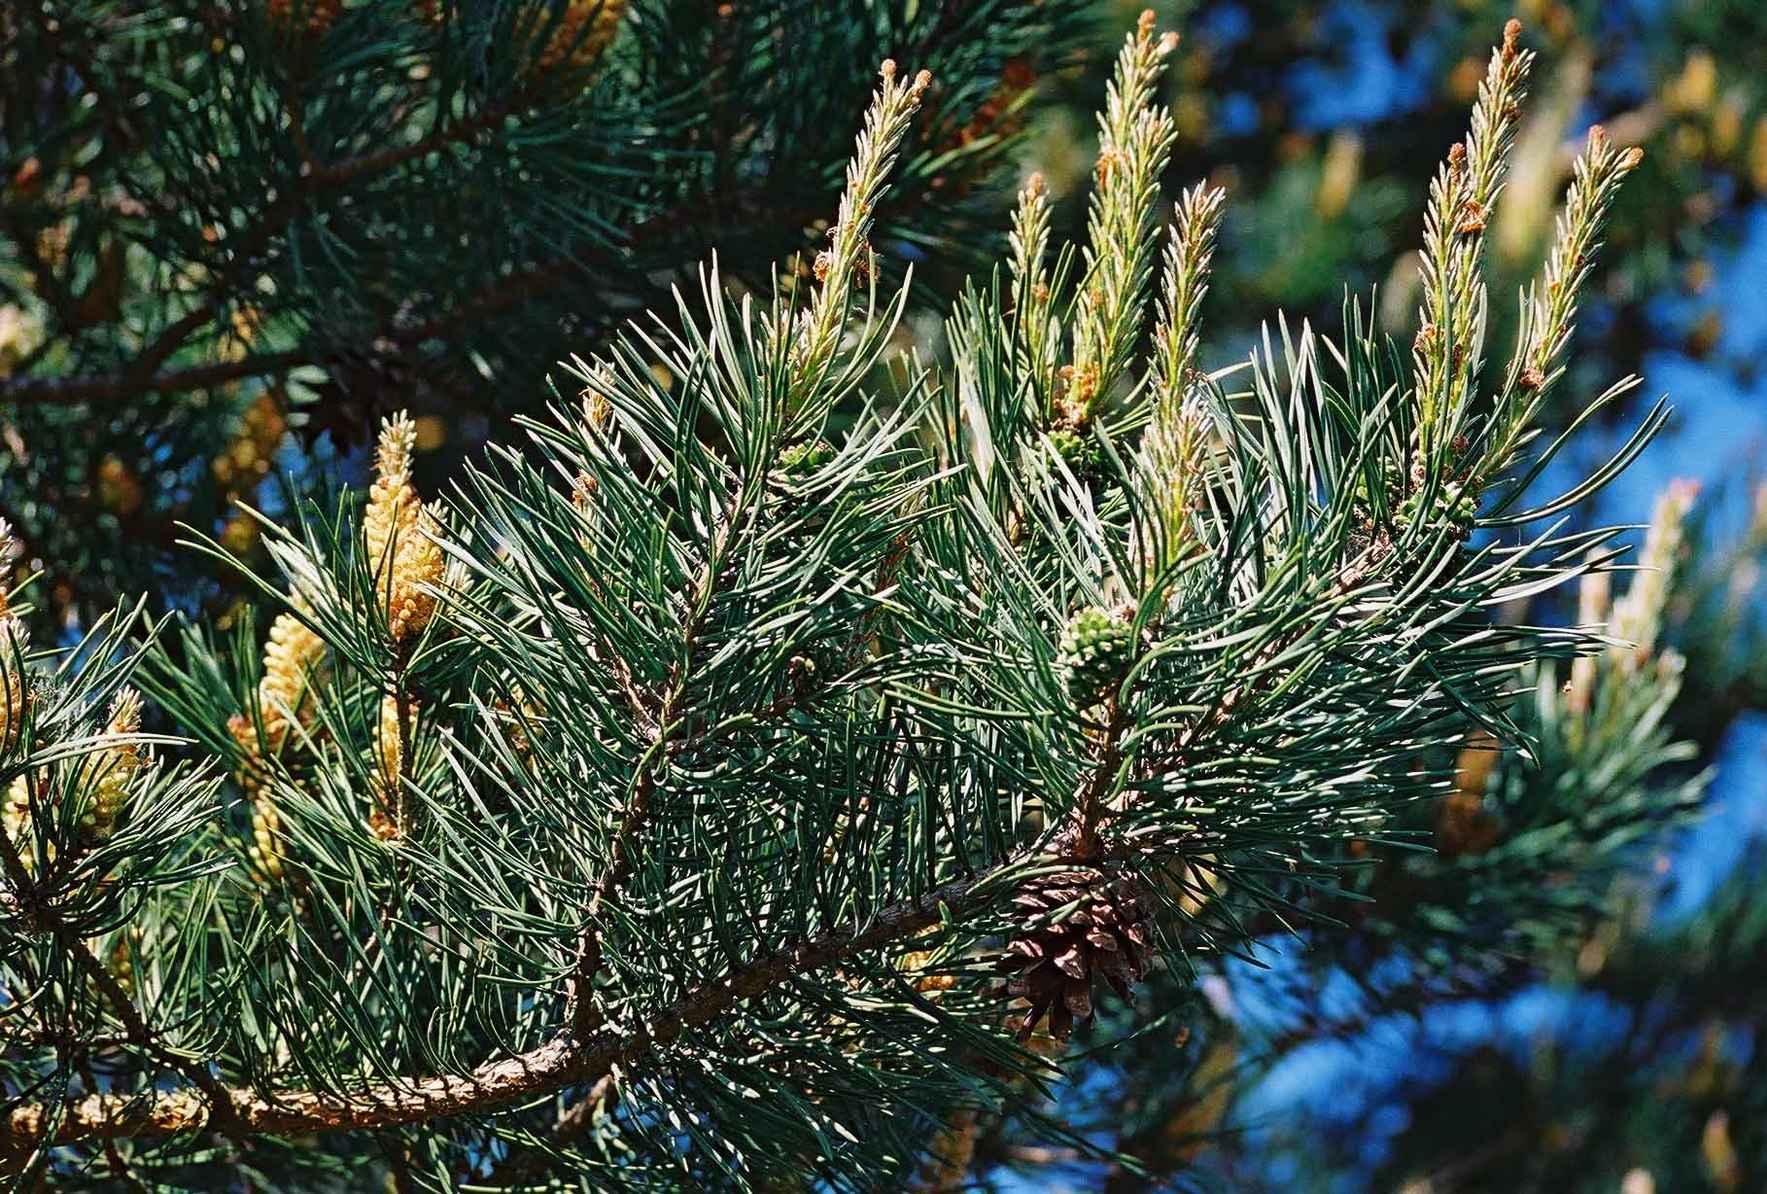 Season of Giving and Healing image